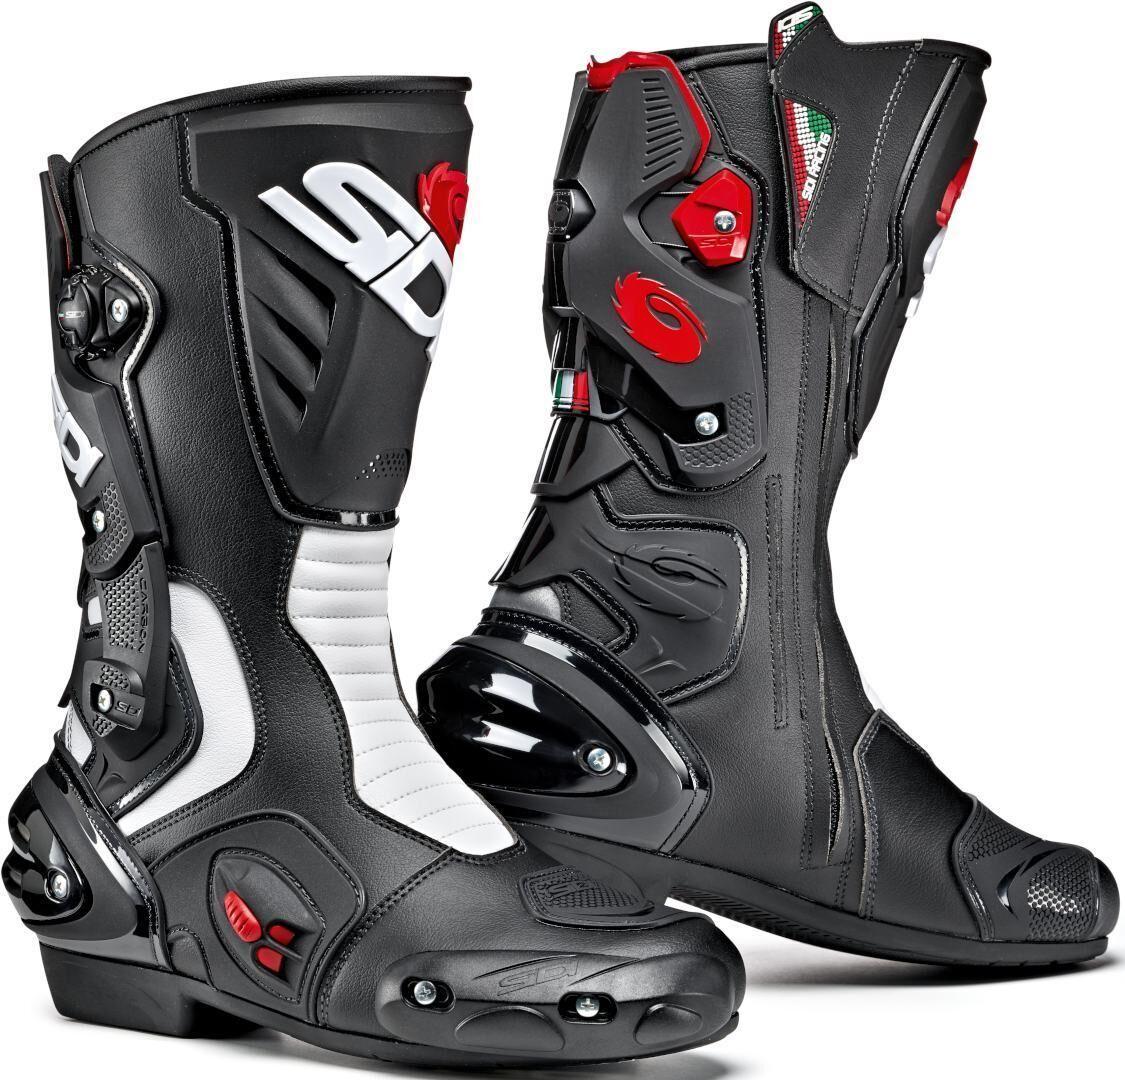 Sidi Vertigo 2 Motorcycle Boots Stivali da moto